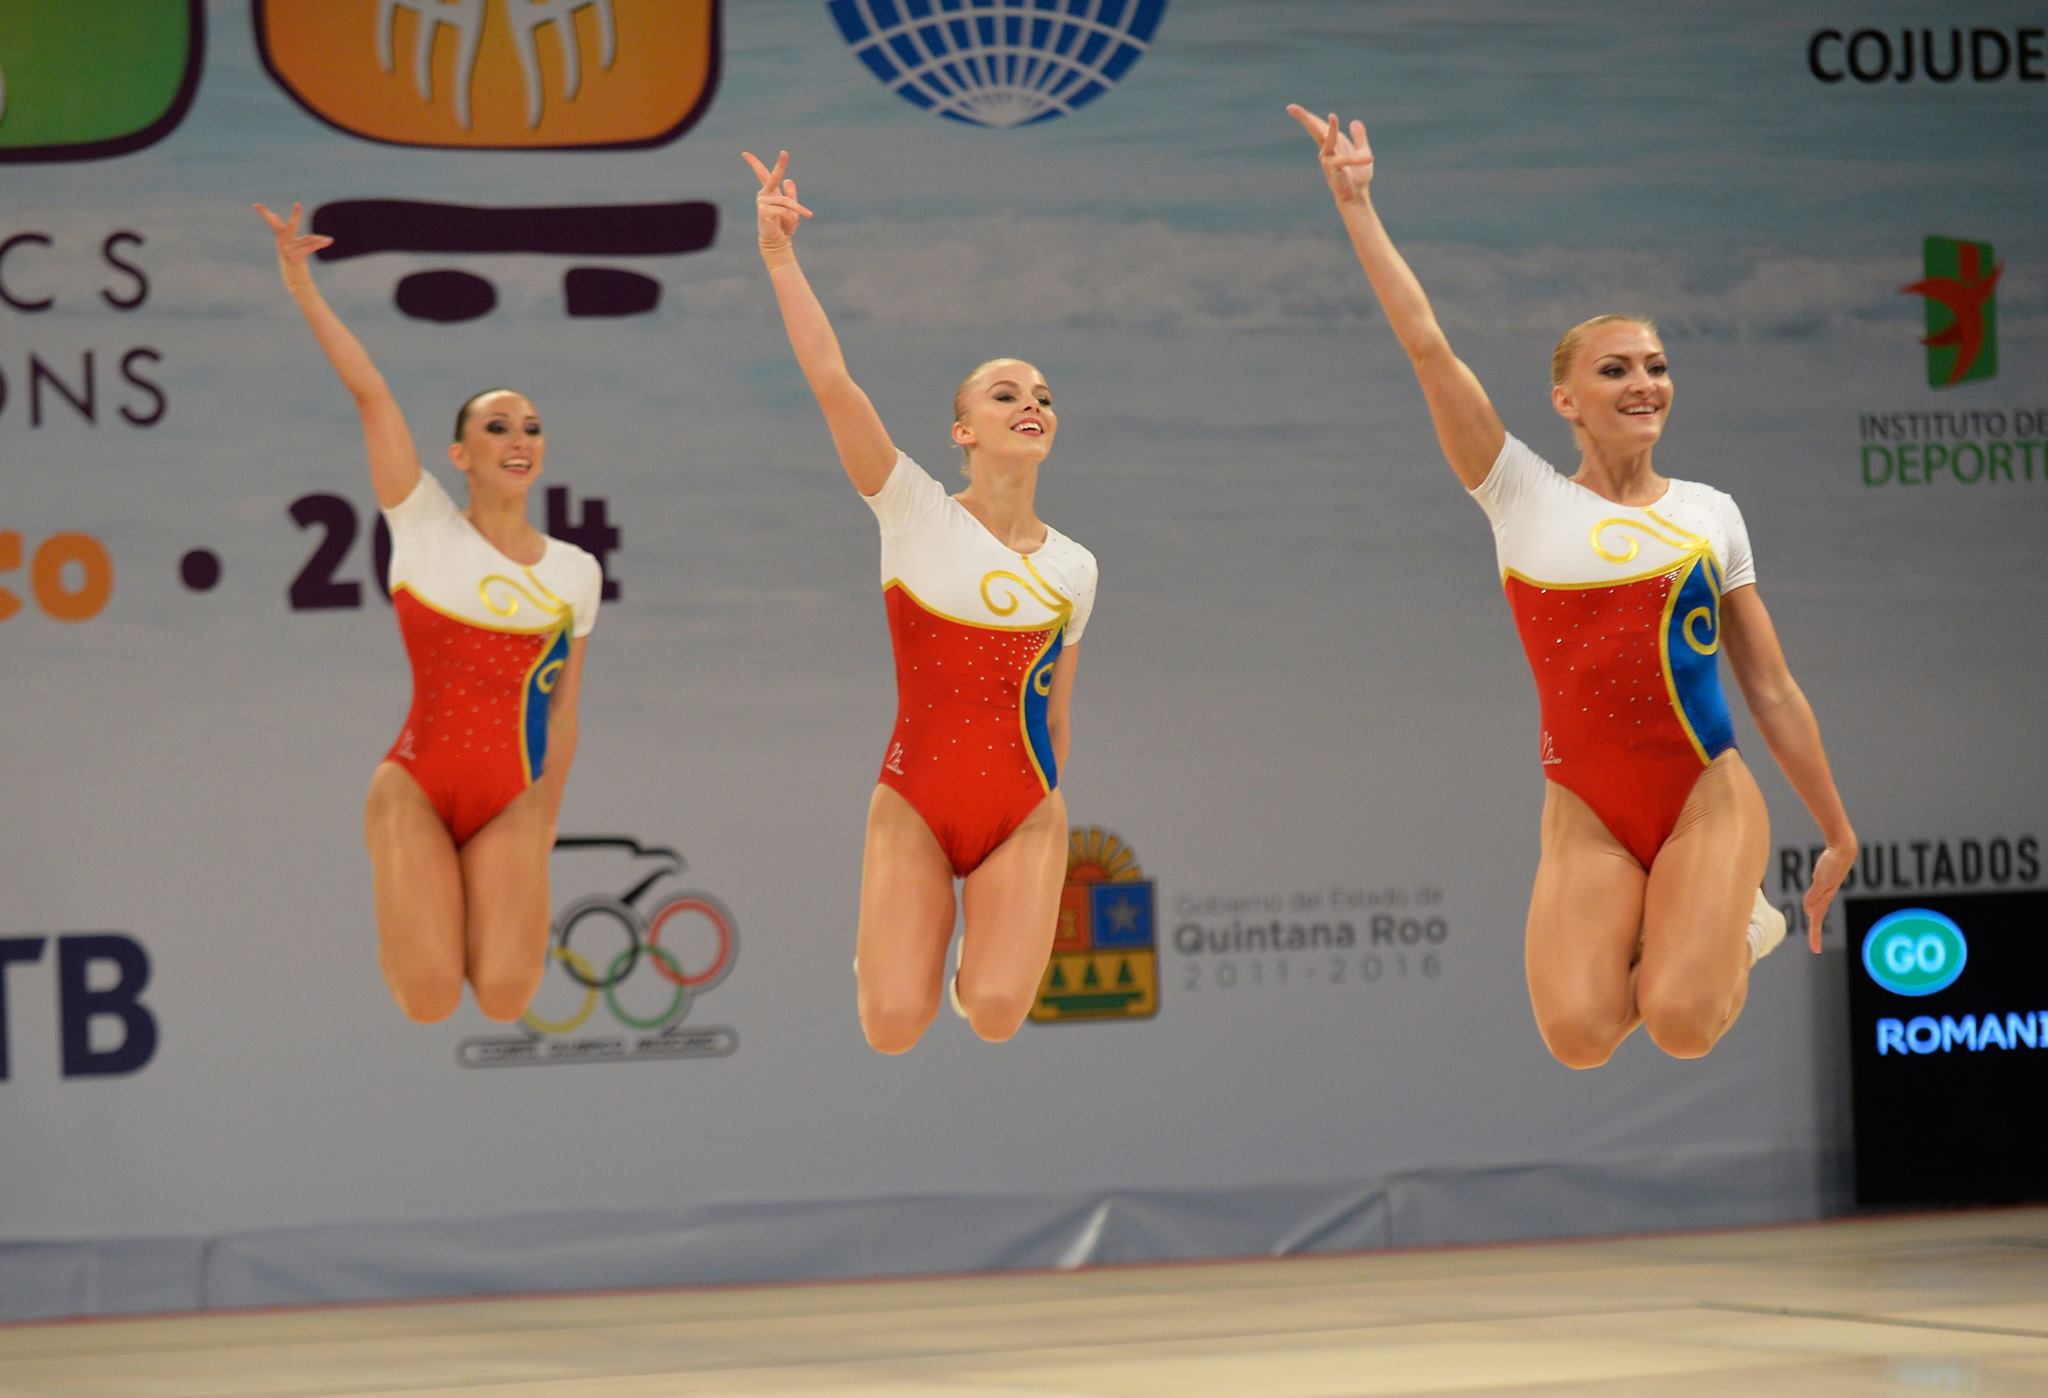 Medalia de aur pentru Romania la CM gimnastica aerobica